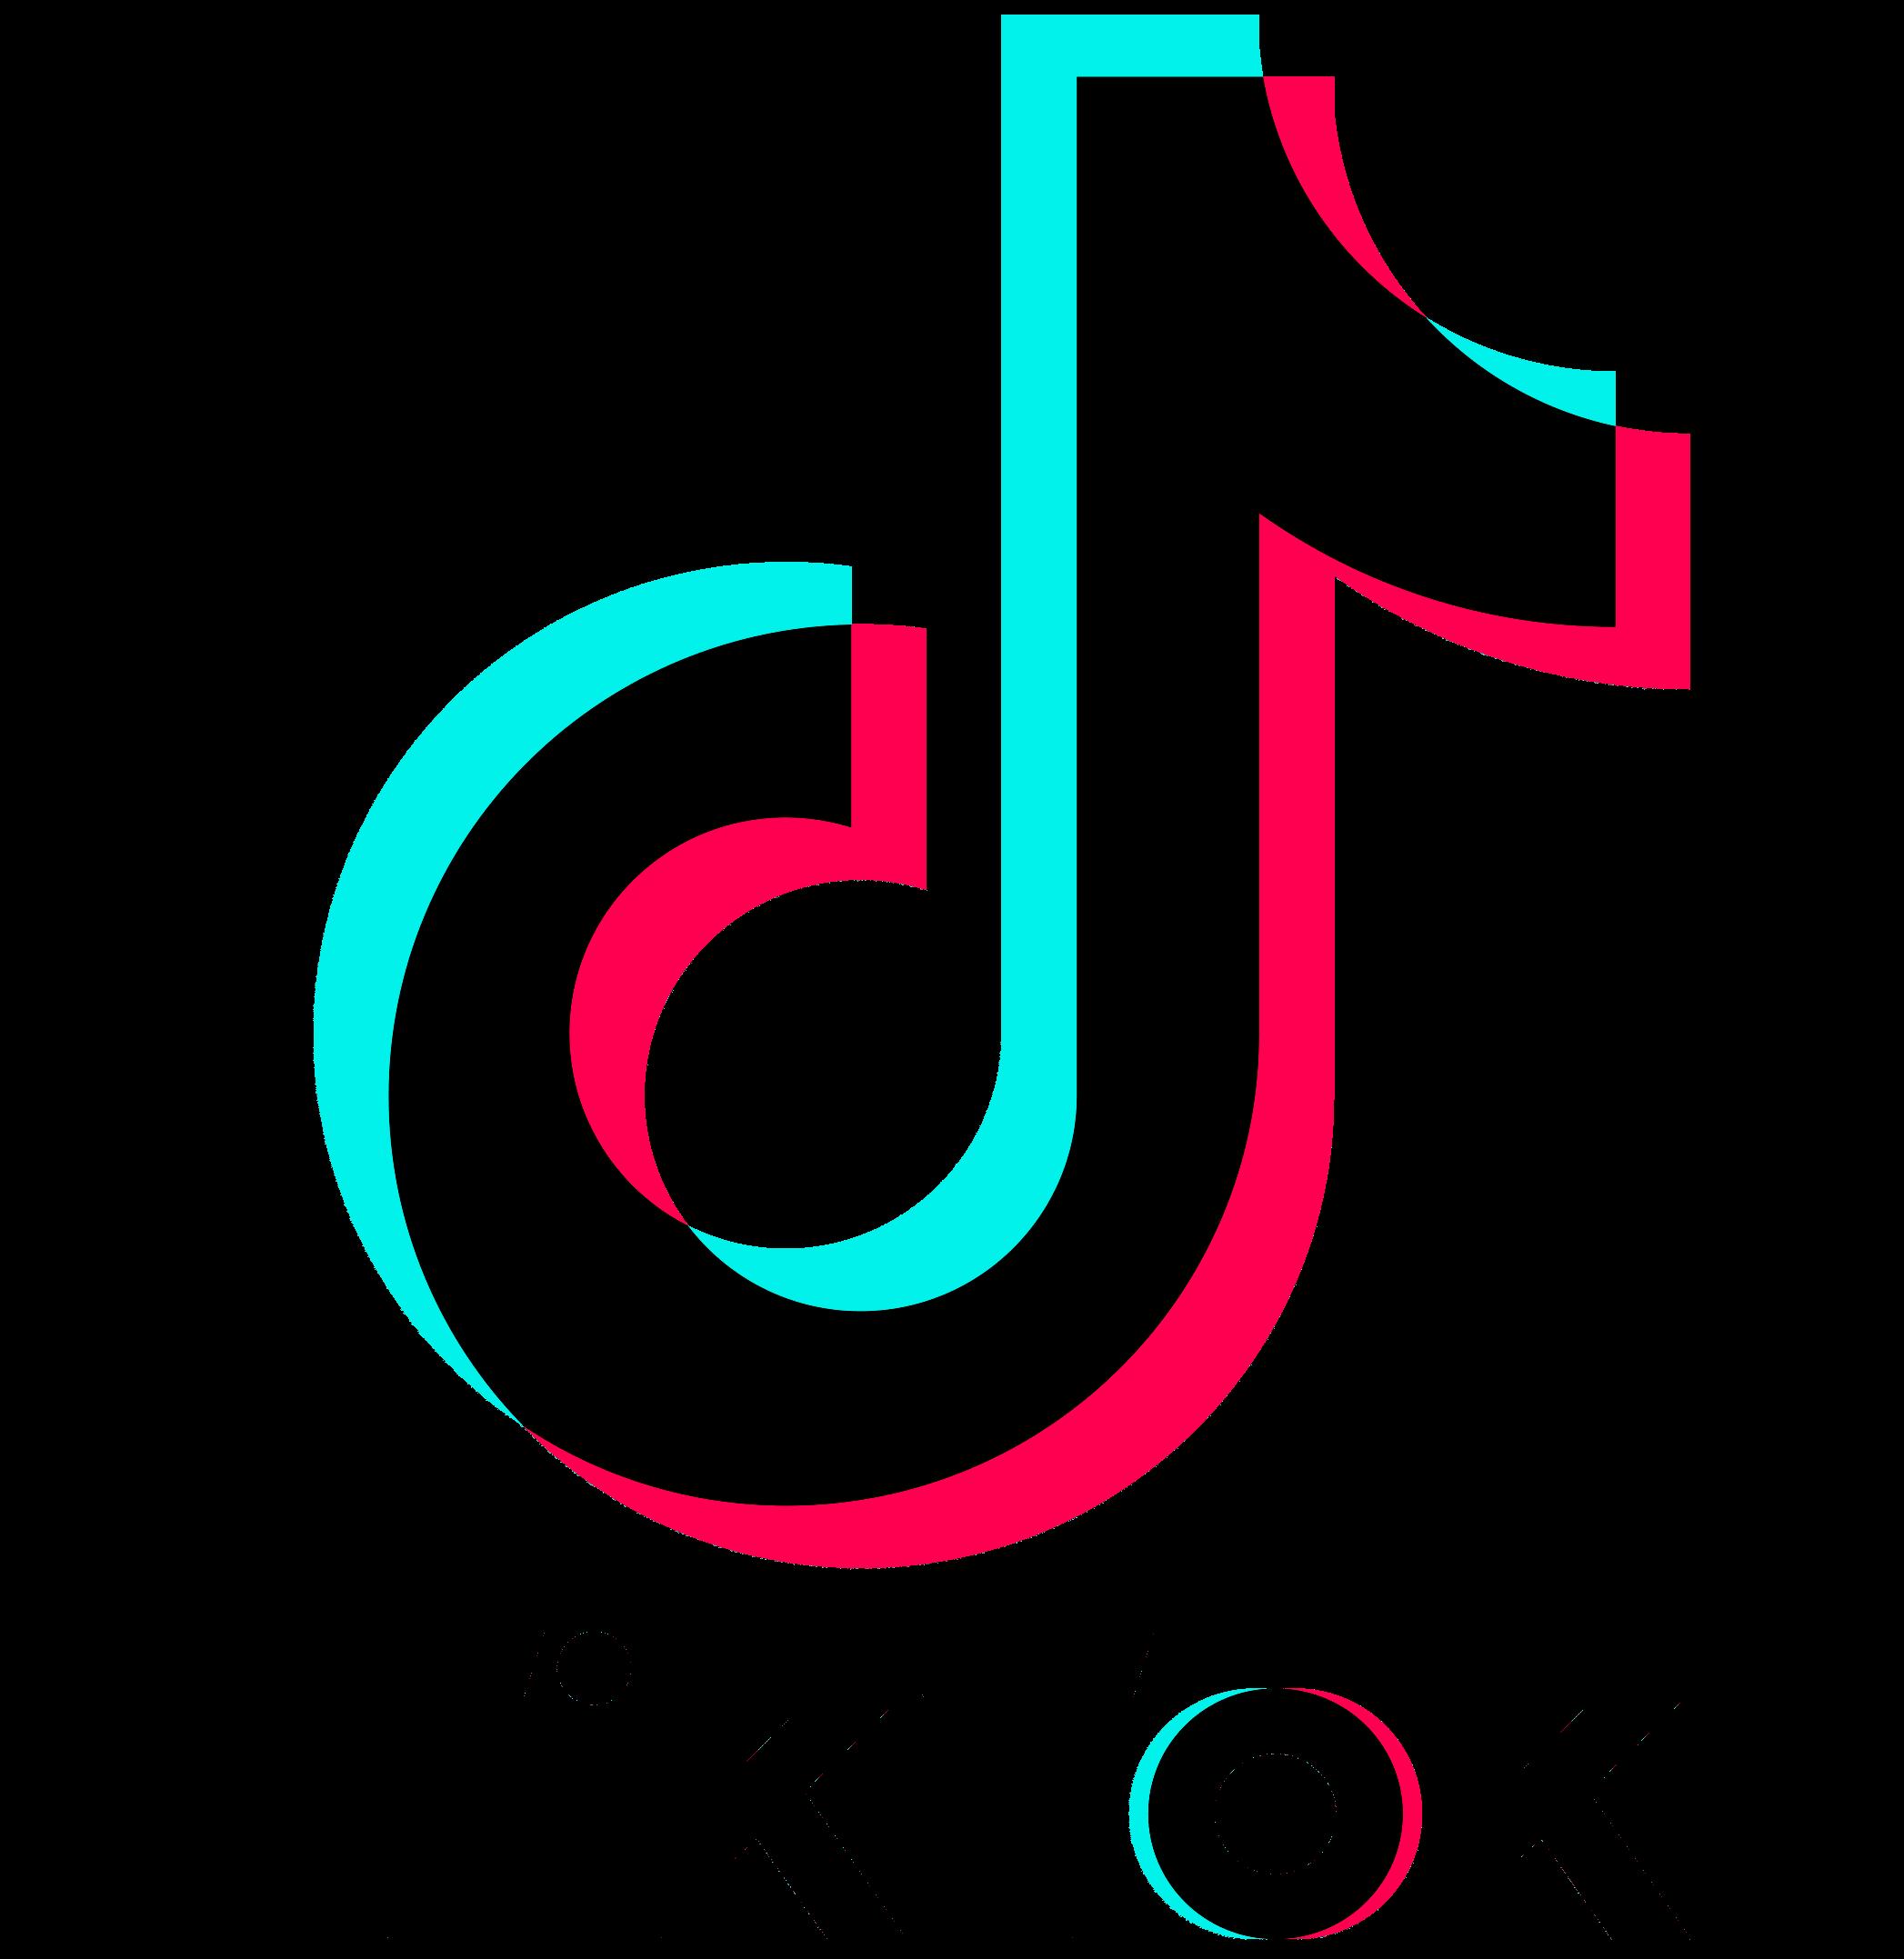 TikTok has over 1.5 billion users worldwide as of May 2020